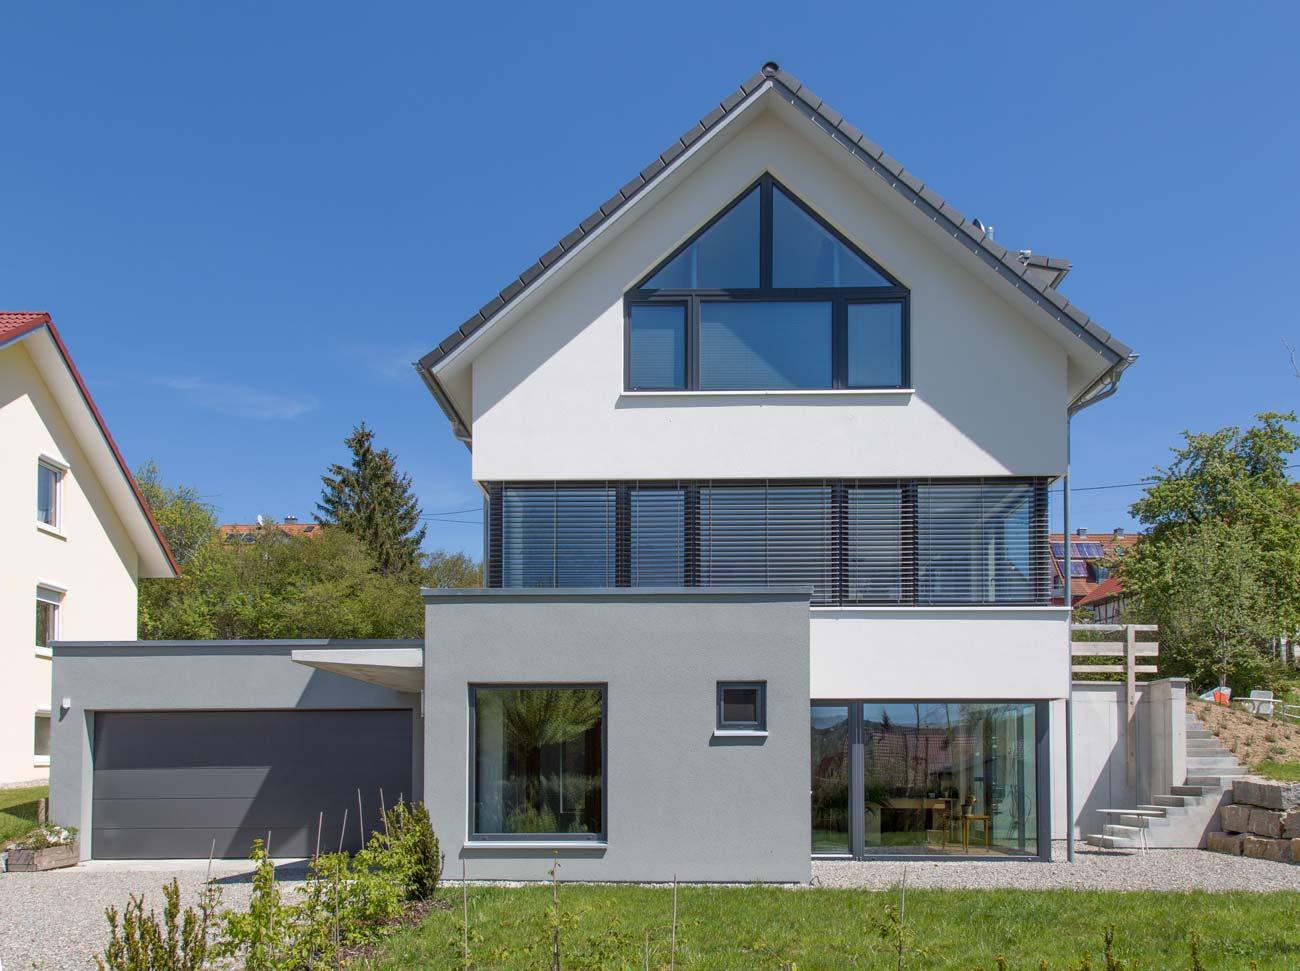 Haus_Esenhausen_Fassade_Fenster